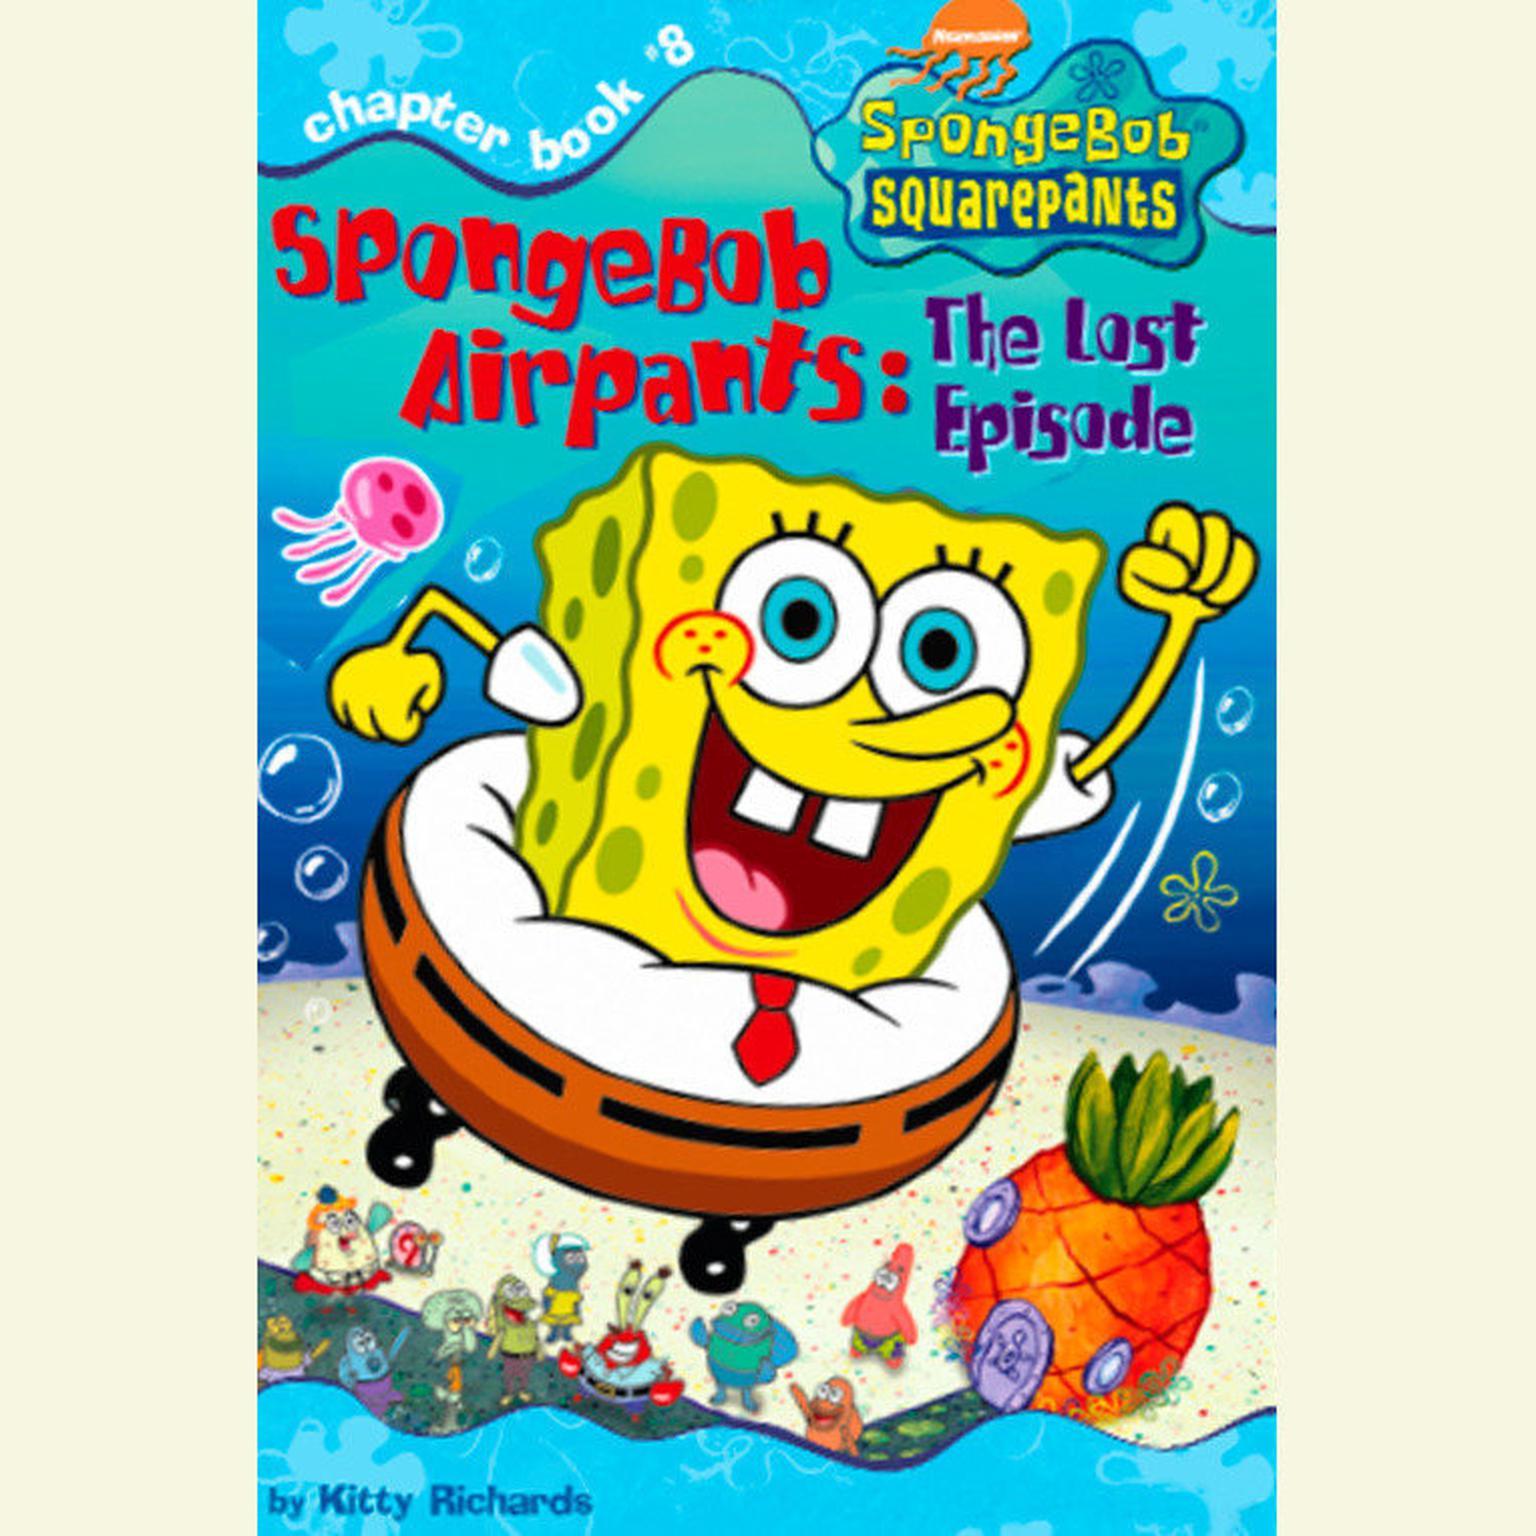 SpongeBob Squarepants #8: SpongeBob AirPants: The Lost Episode Audiobook.